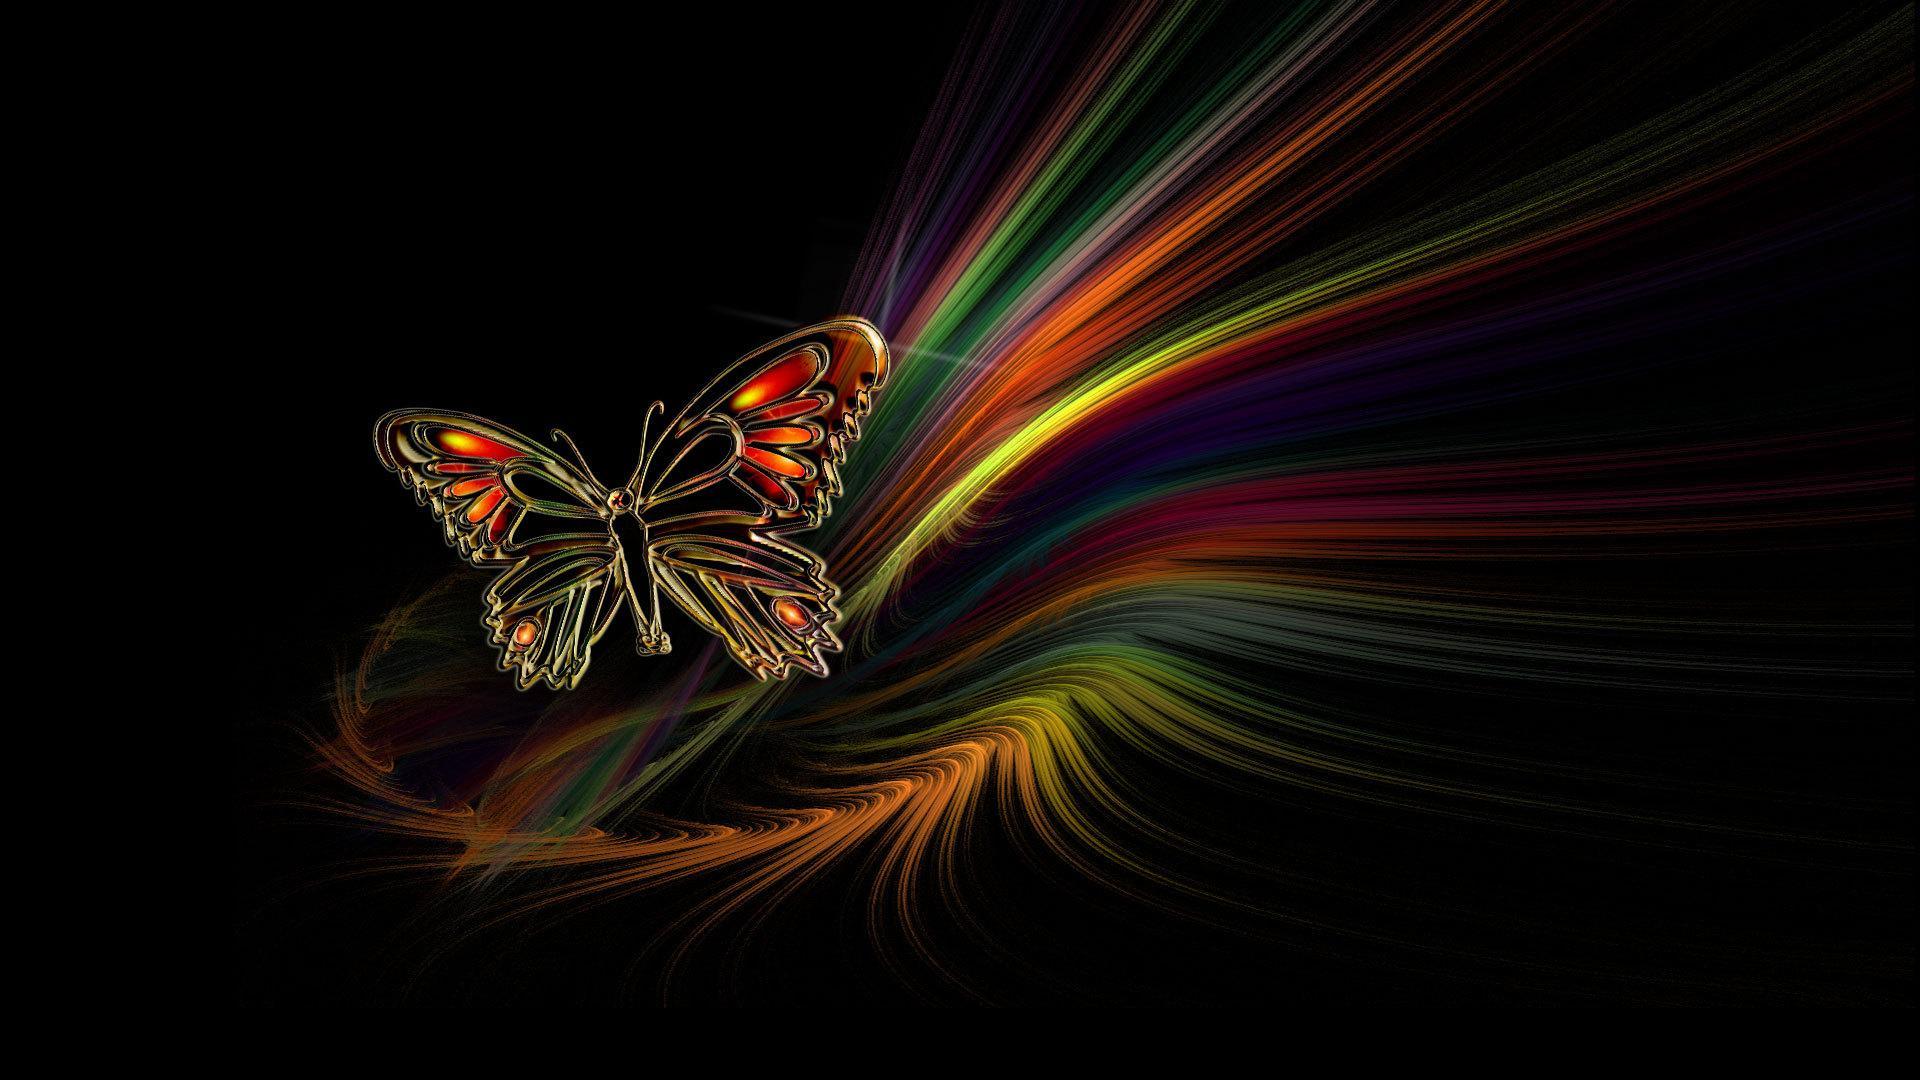 Butterfly Abstract HD Desktop Wallpaper HD Desktop Wallpaper 1920x1080